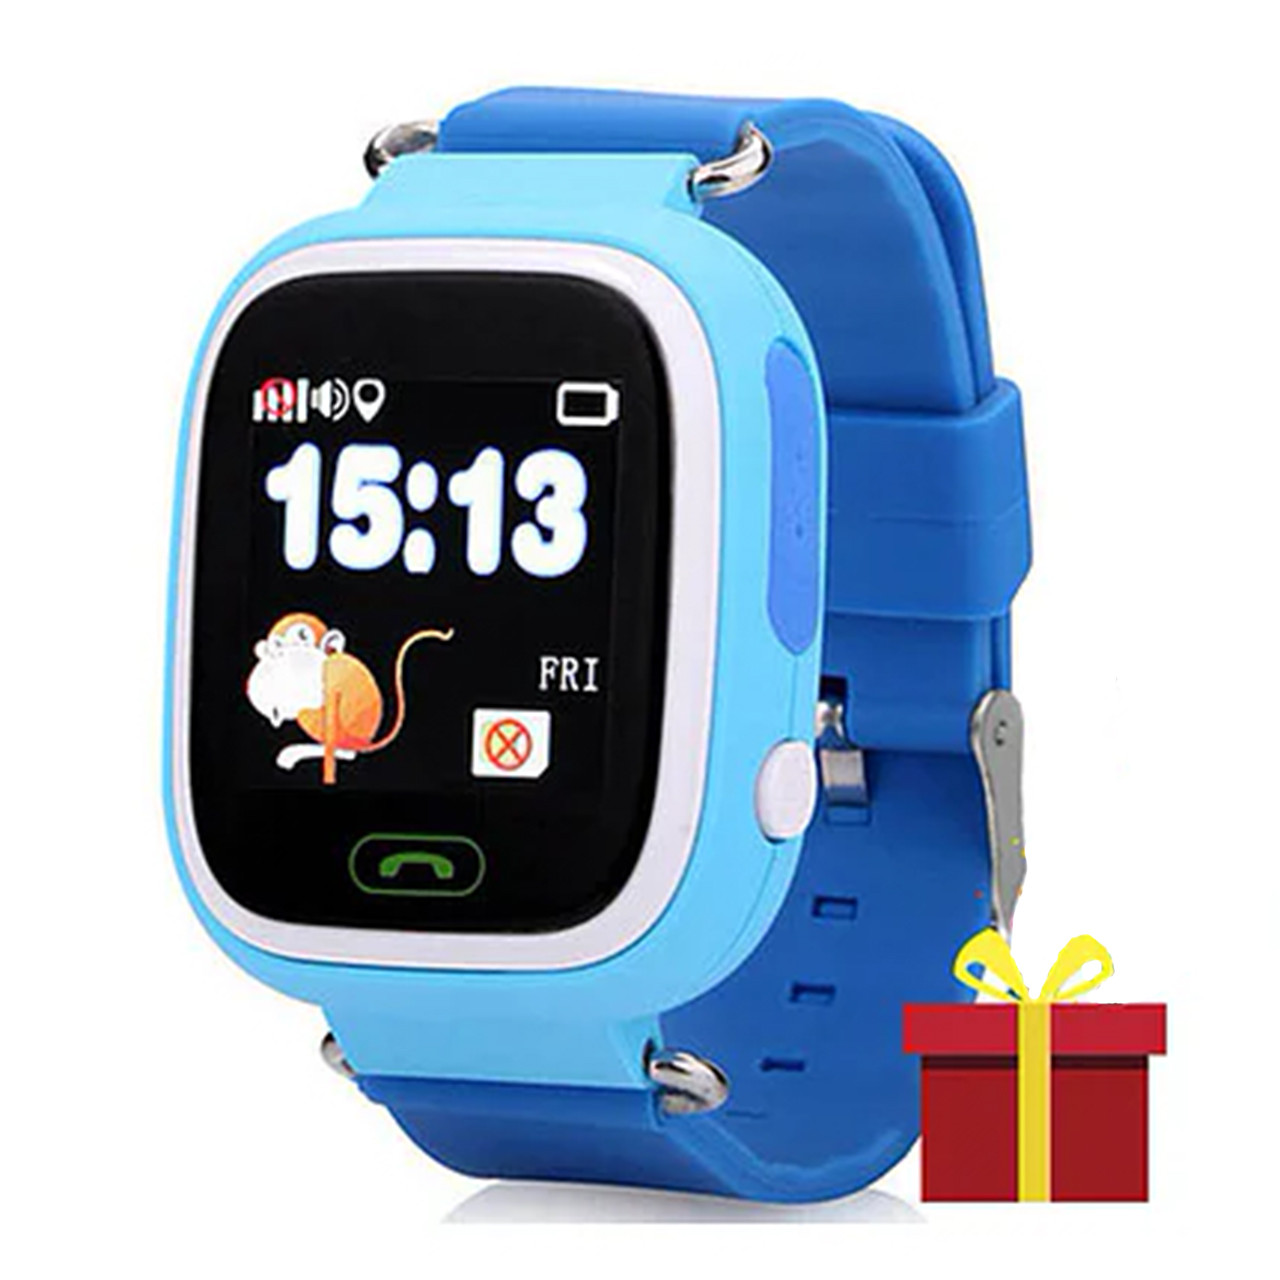 ✓Смарт-годинник UWatch Q90 Blue дитячі Wi-Fi з GPS трекером Блютуз 400 маг Android IOS